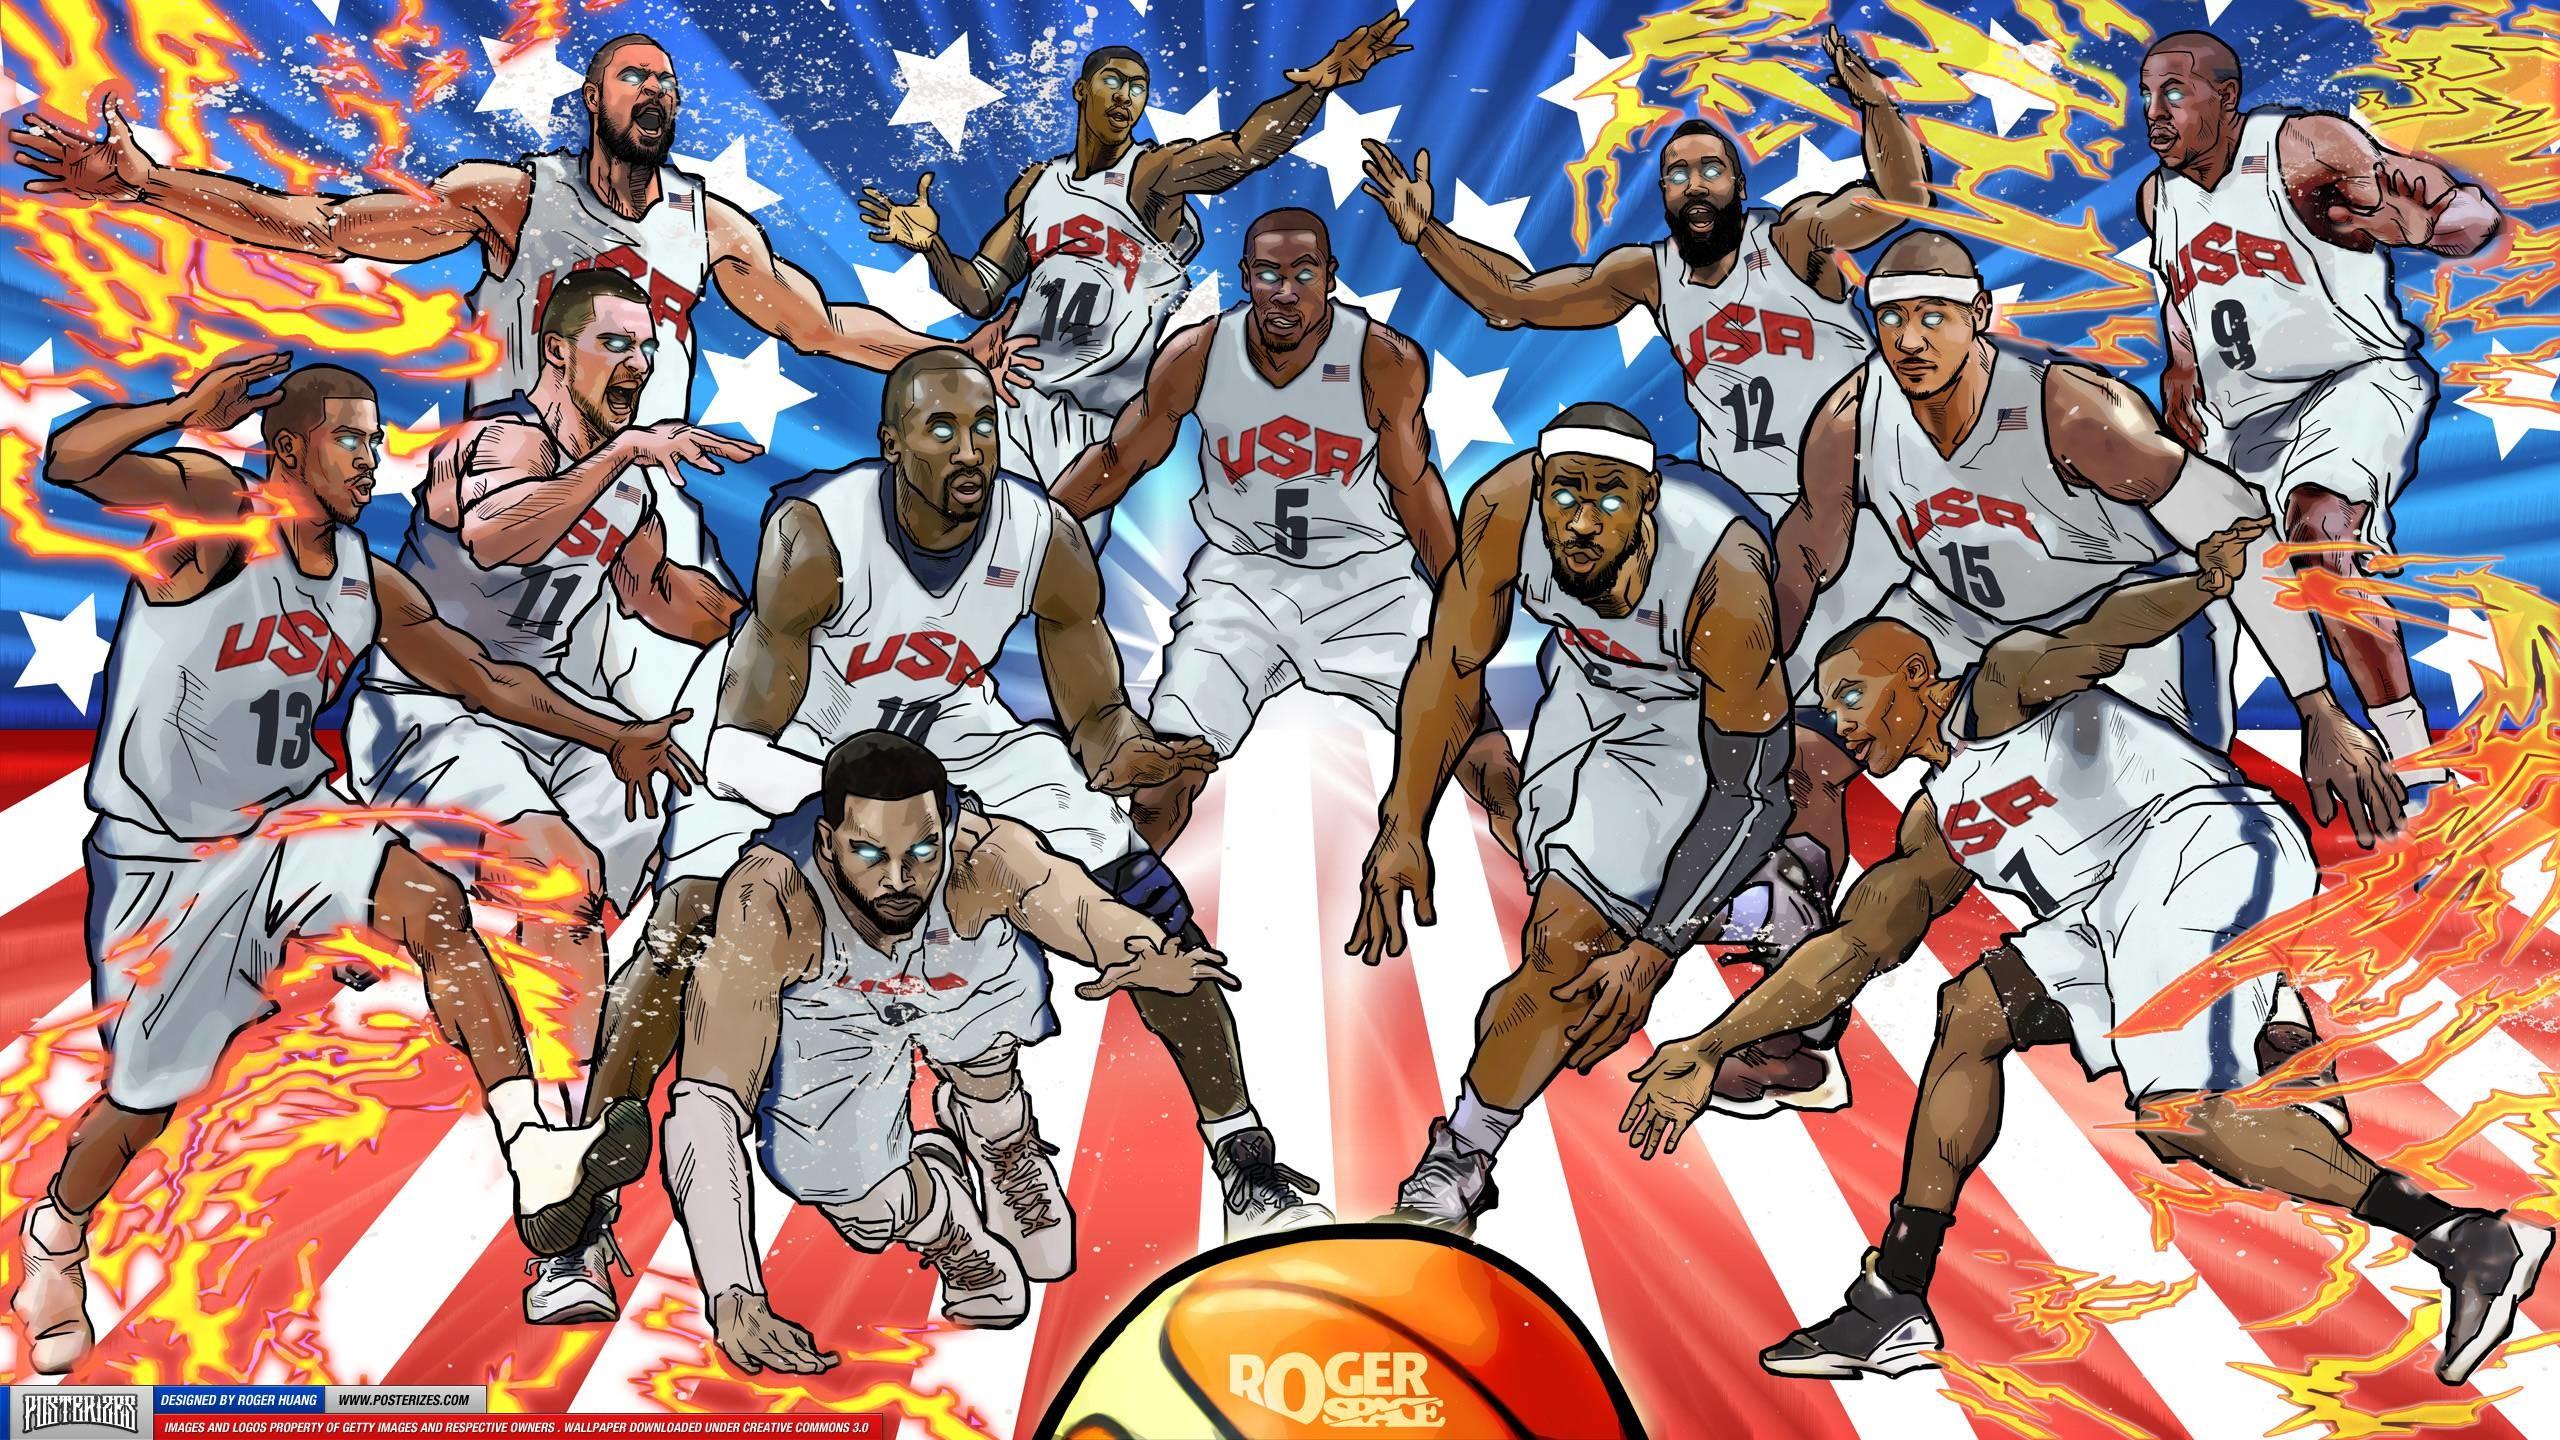 2560x1440 Nba Basketball Wallpapers 2015 - Wallpaper Cave